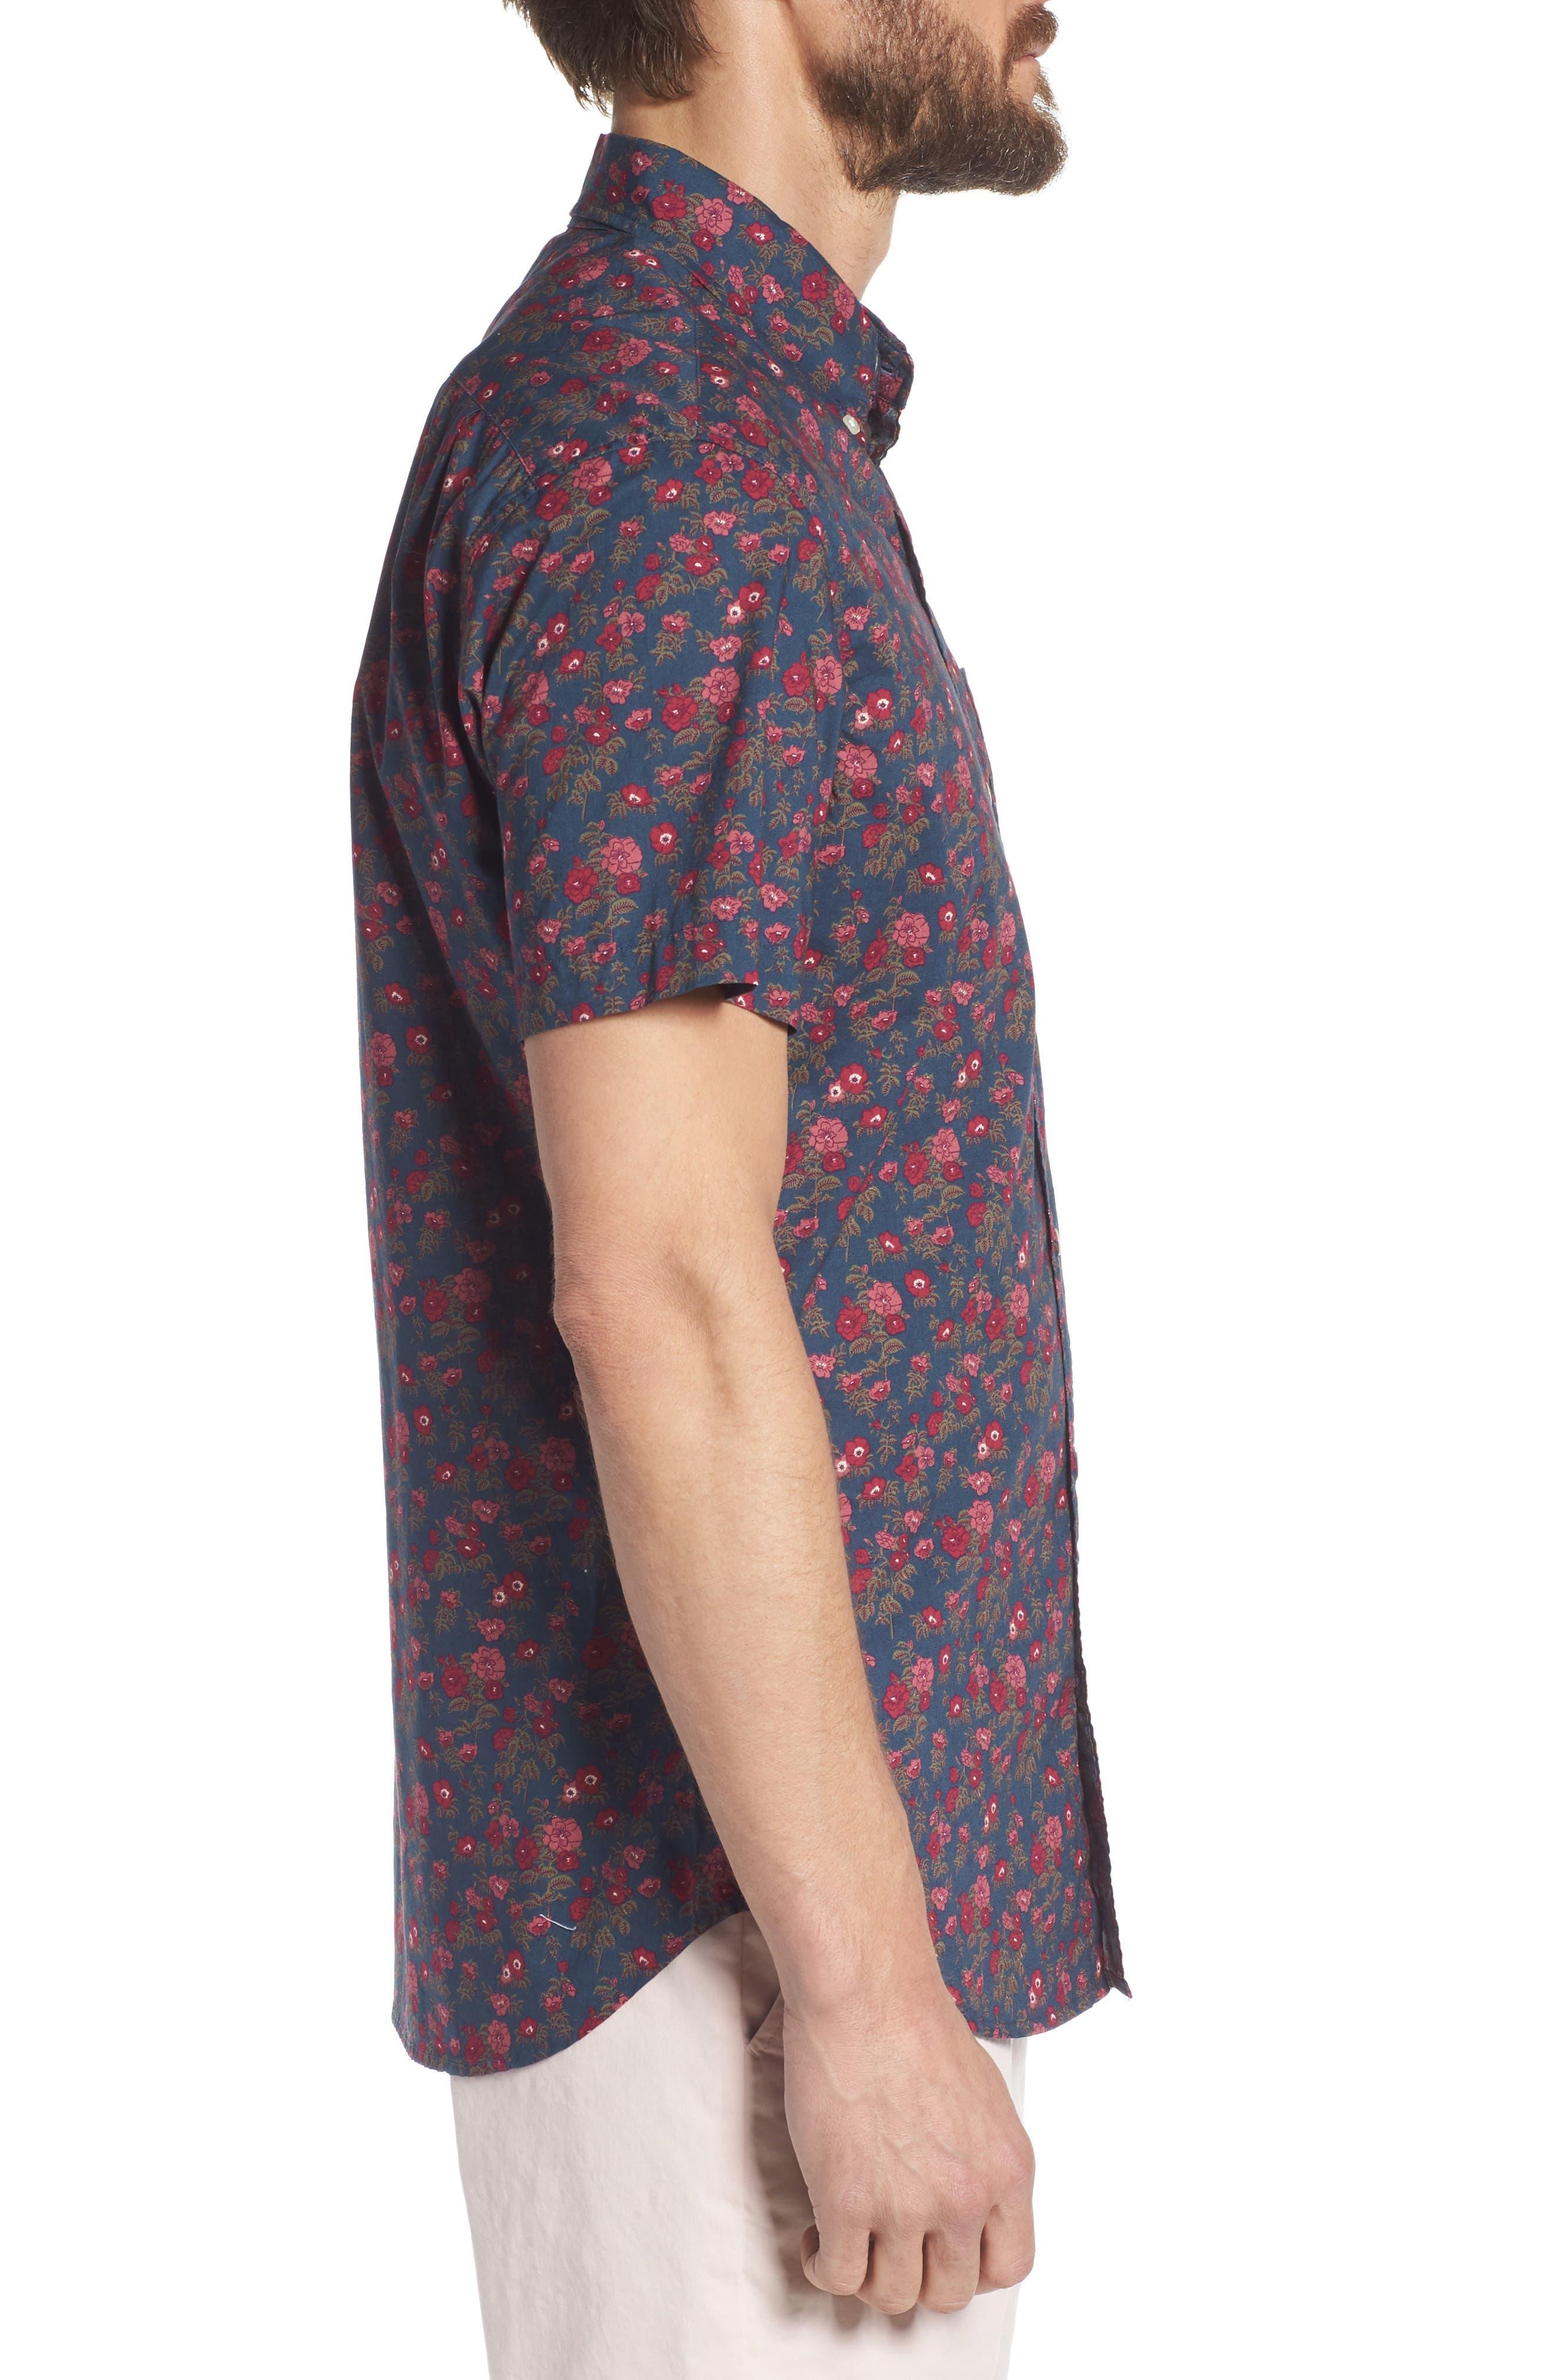 Riviera Slim Fit Floral Print Sport Shirt,                             Alternate thumbnail 4, color,                             Dandy Floral - Pickled Beet